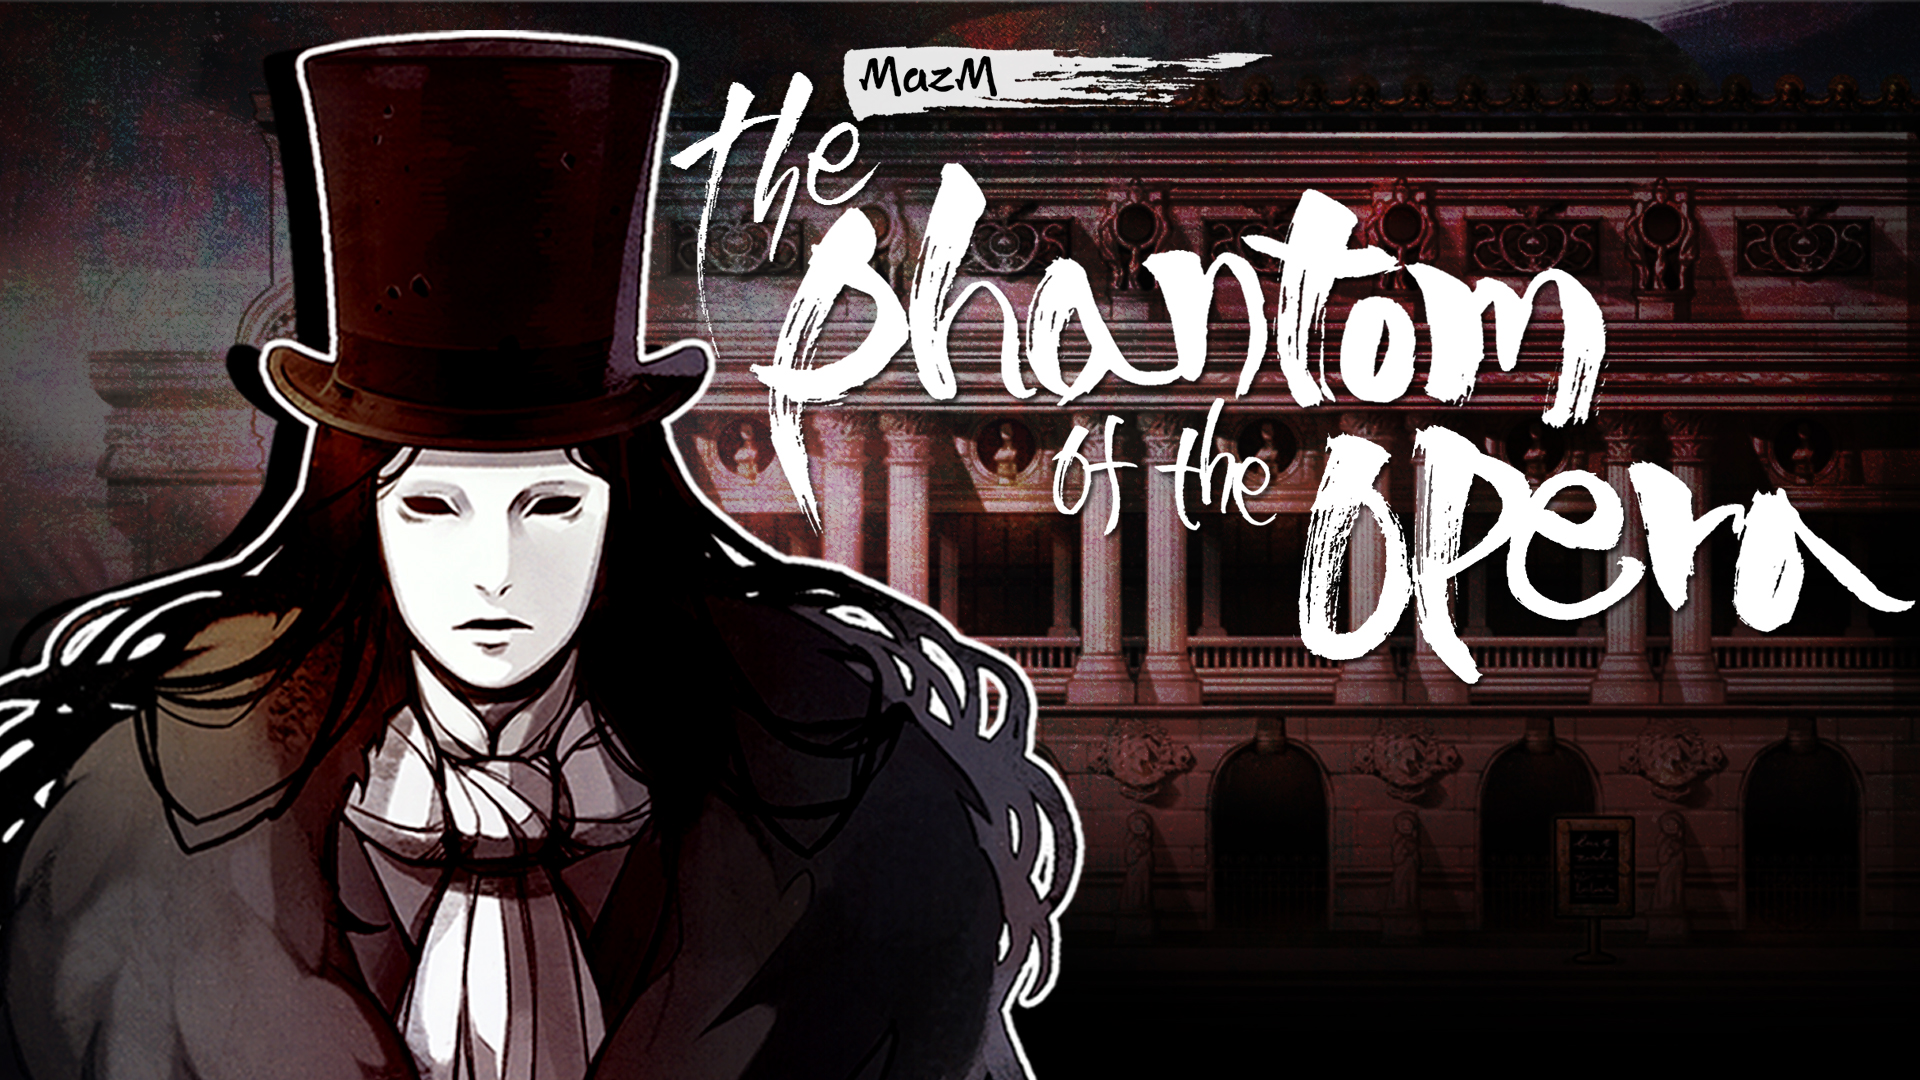 MazM-The-Phantom-of-the-Opera_2021_03-10-21_001